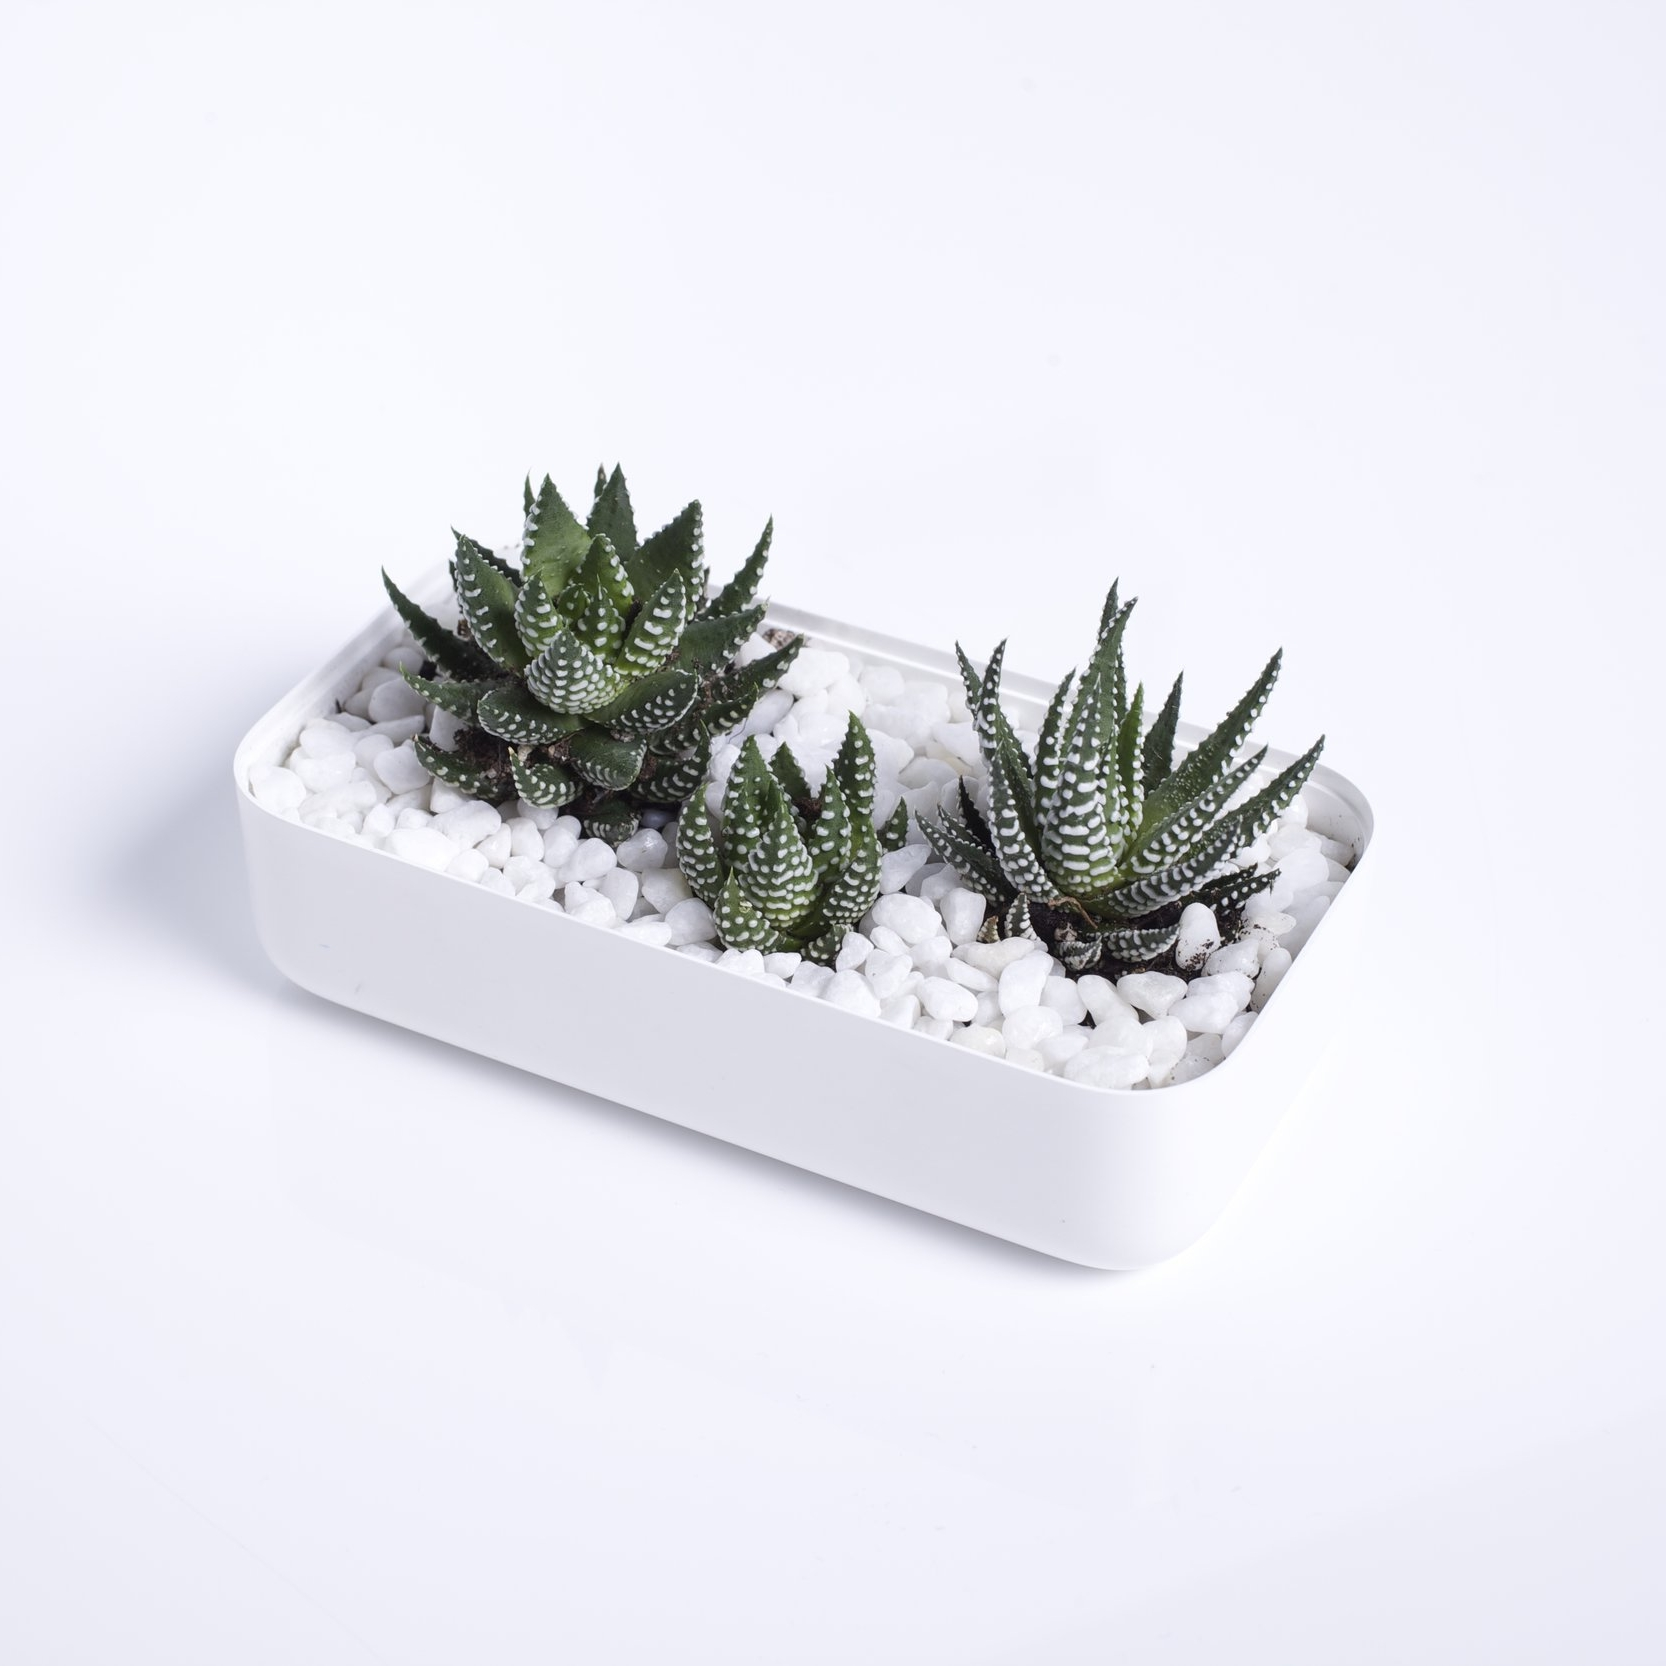 Planter - iPhone 5c box